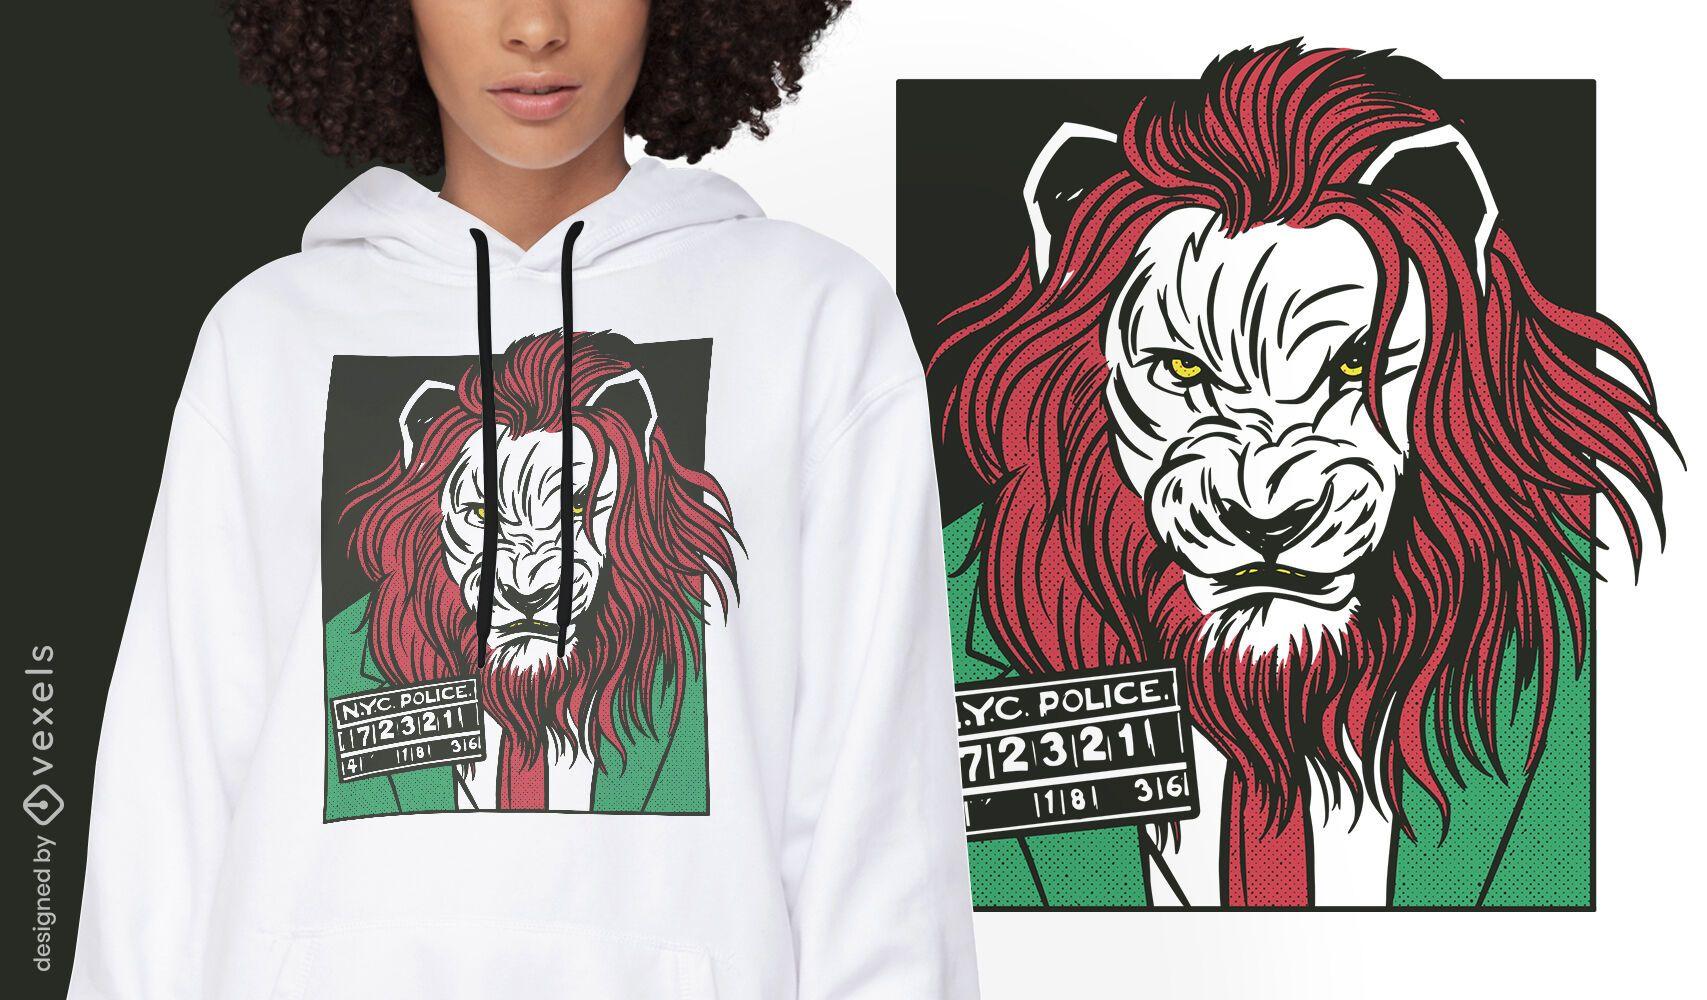 Lion criminal animal comic t-shirt design